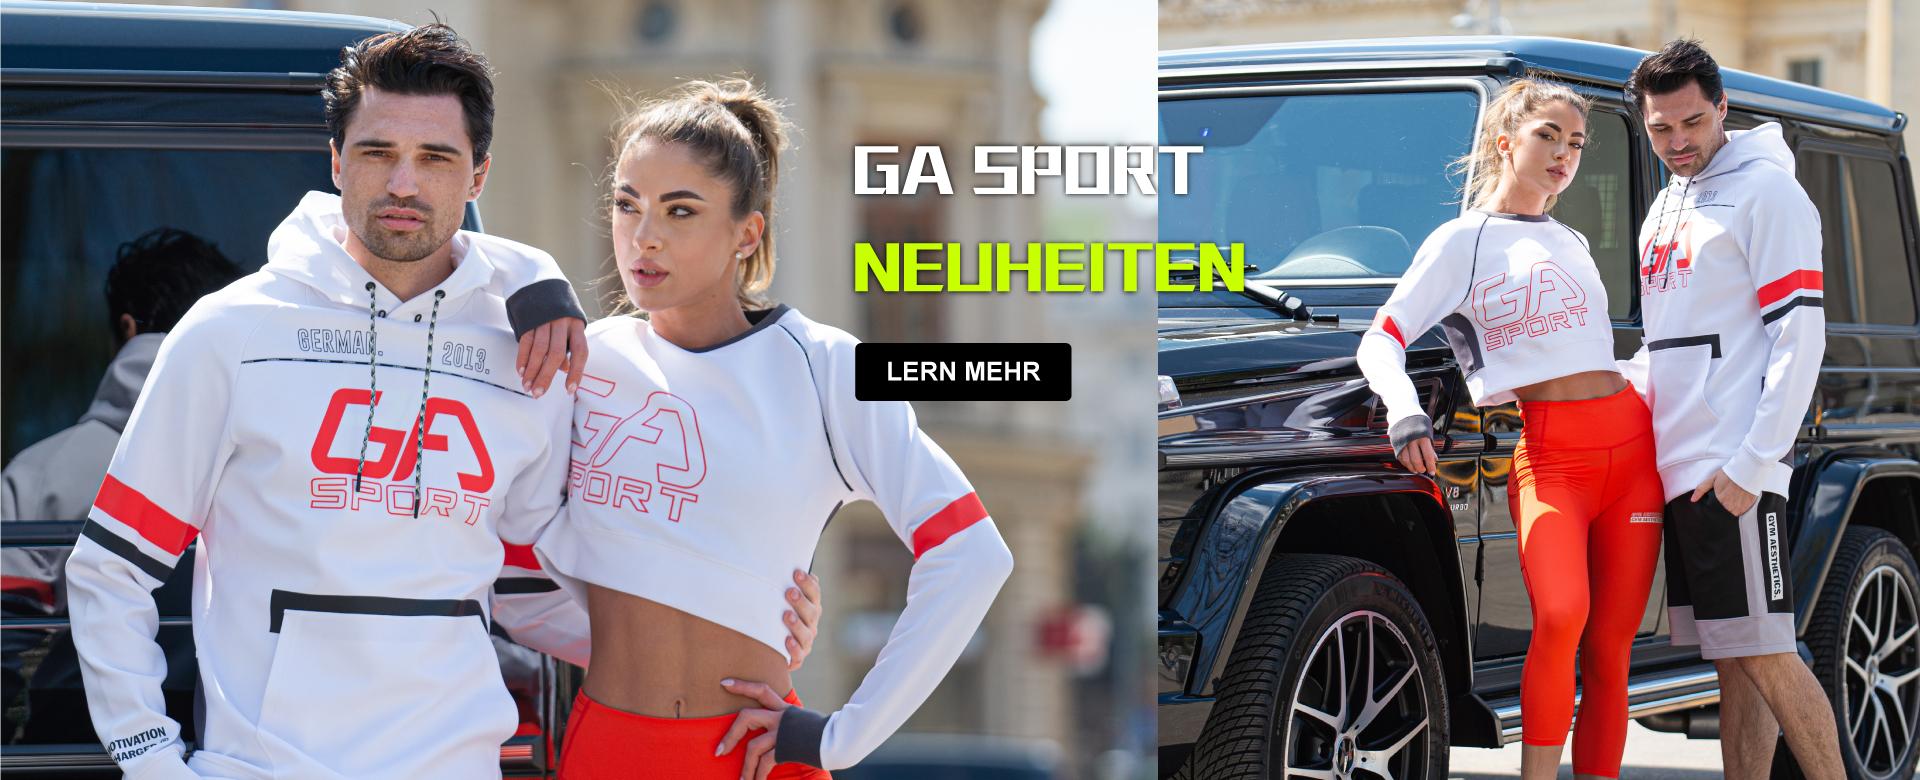 GA Sport - Neuheiten | Gym Aesthetics